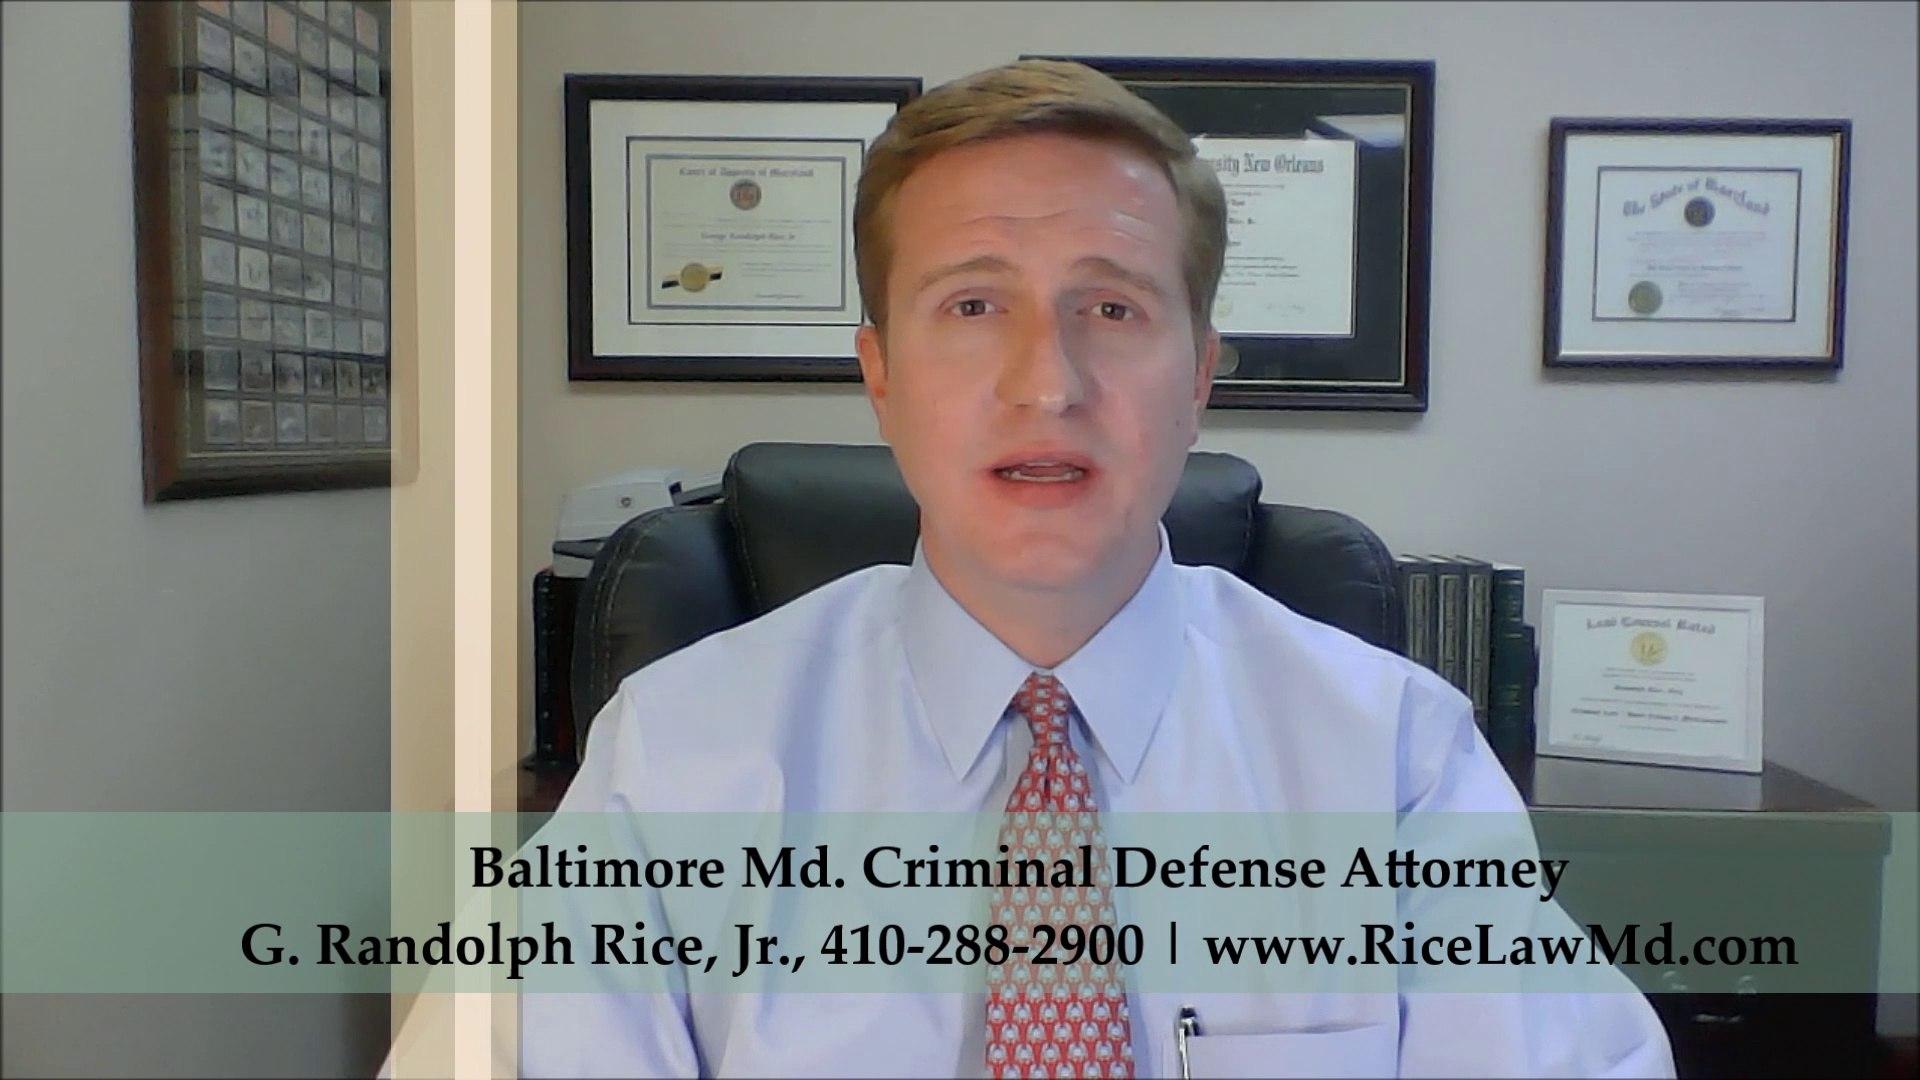 Baltimore Maryland Criminal Defense Attorney G. Randolph Rice Jr.